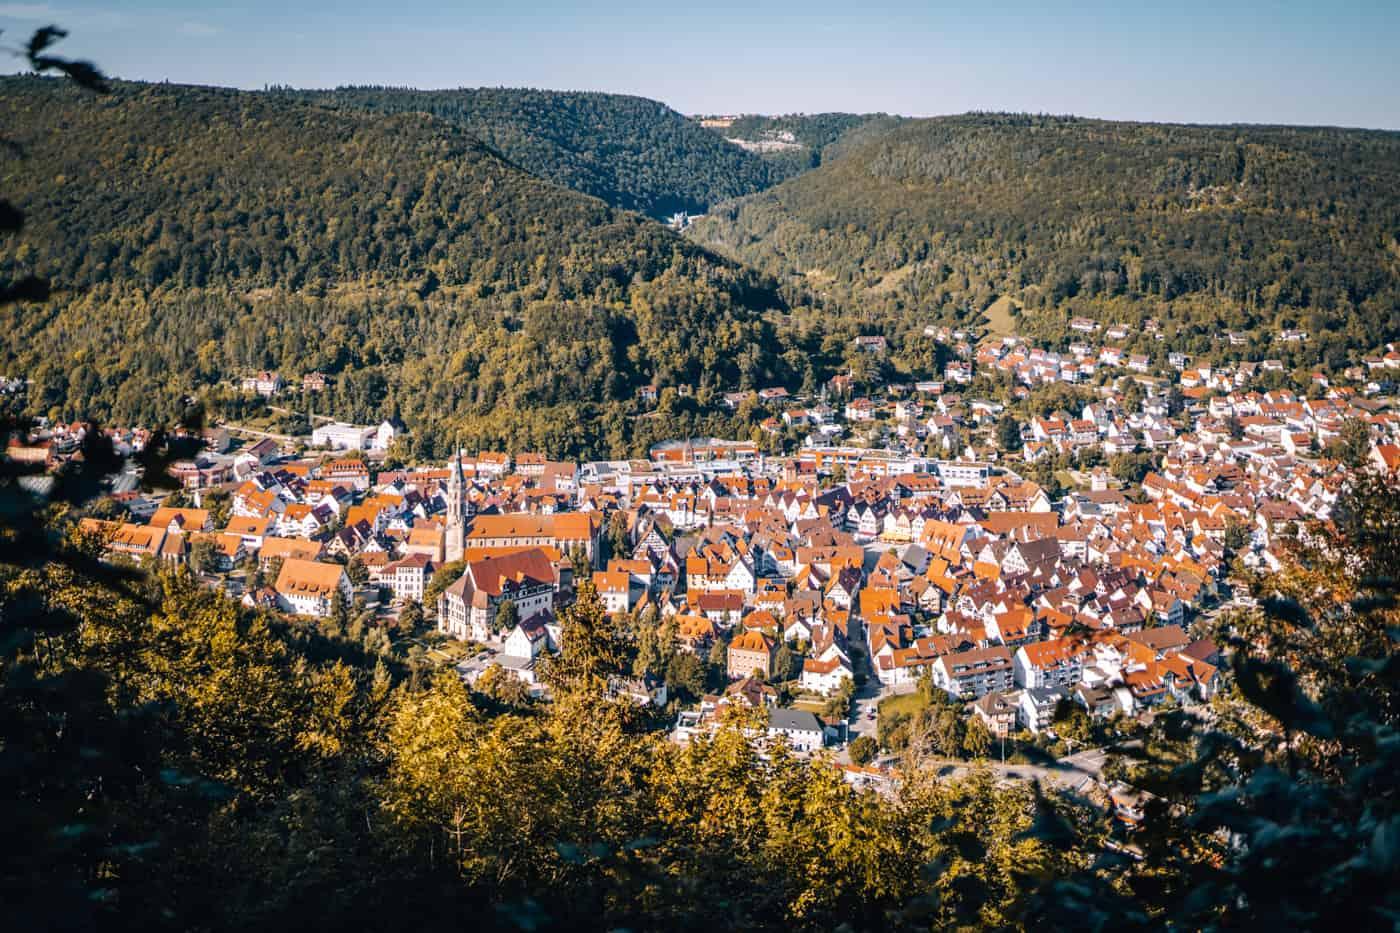 Ausflugsziele Stuttgart #1 - Hohenurachsteig